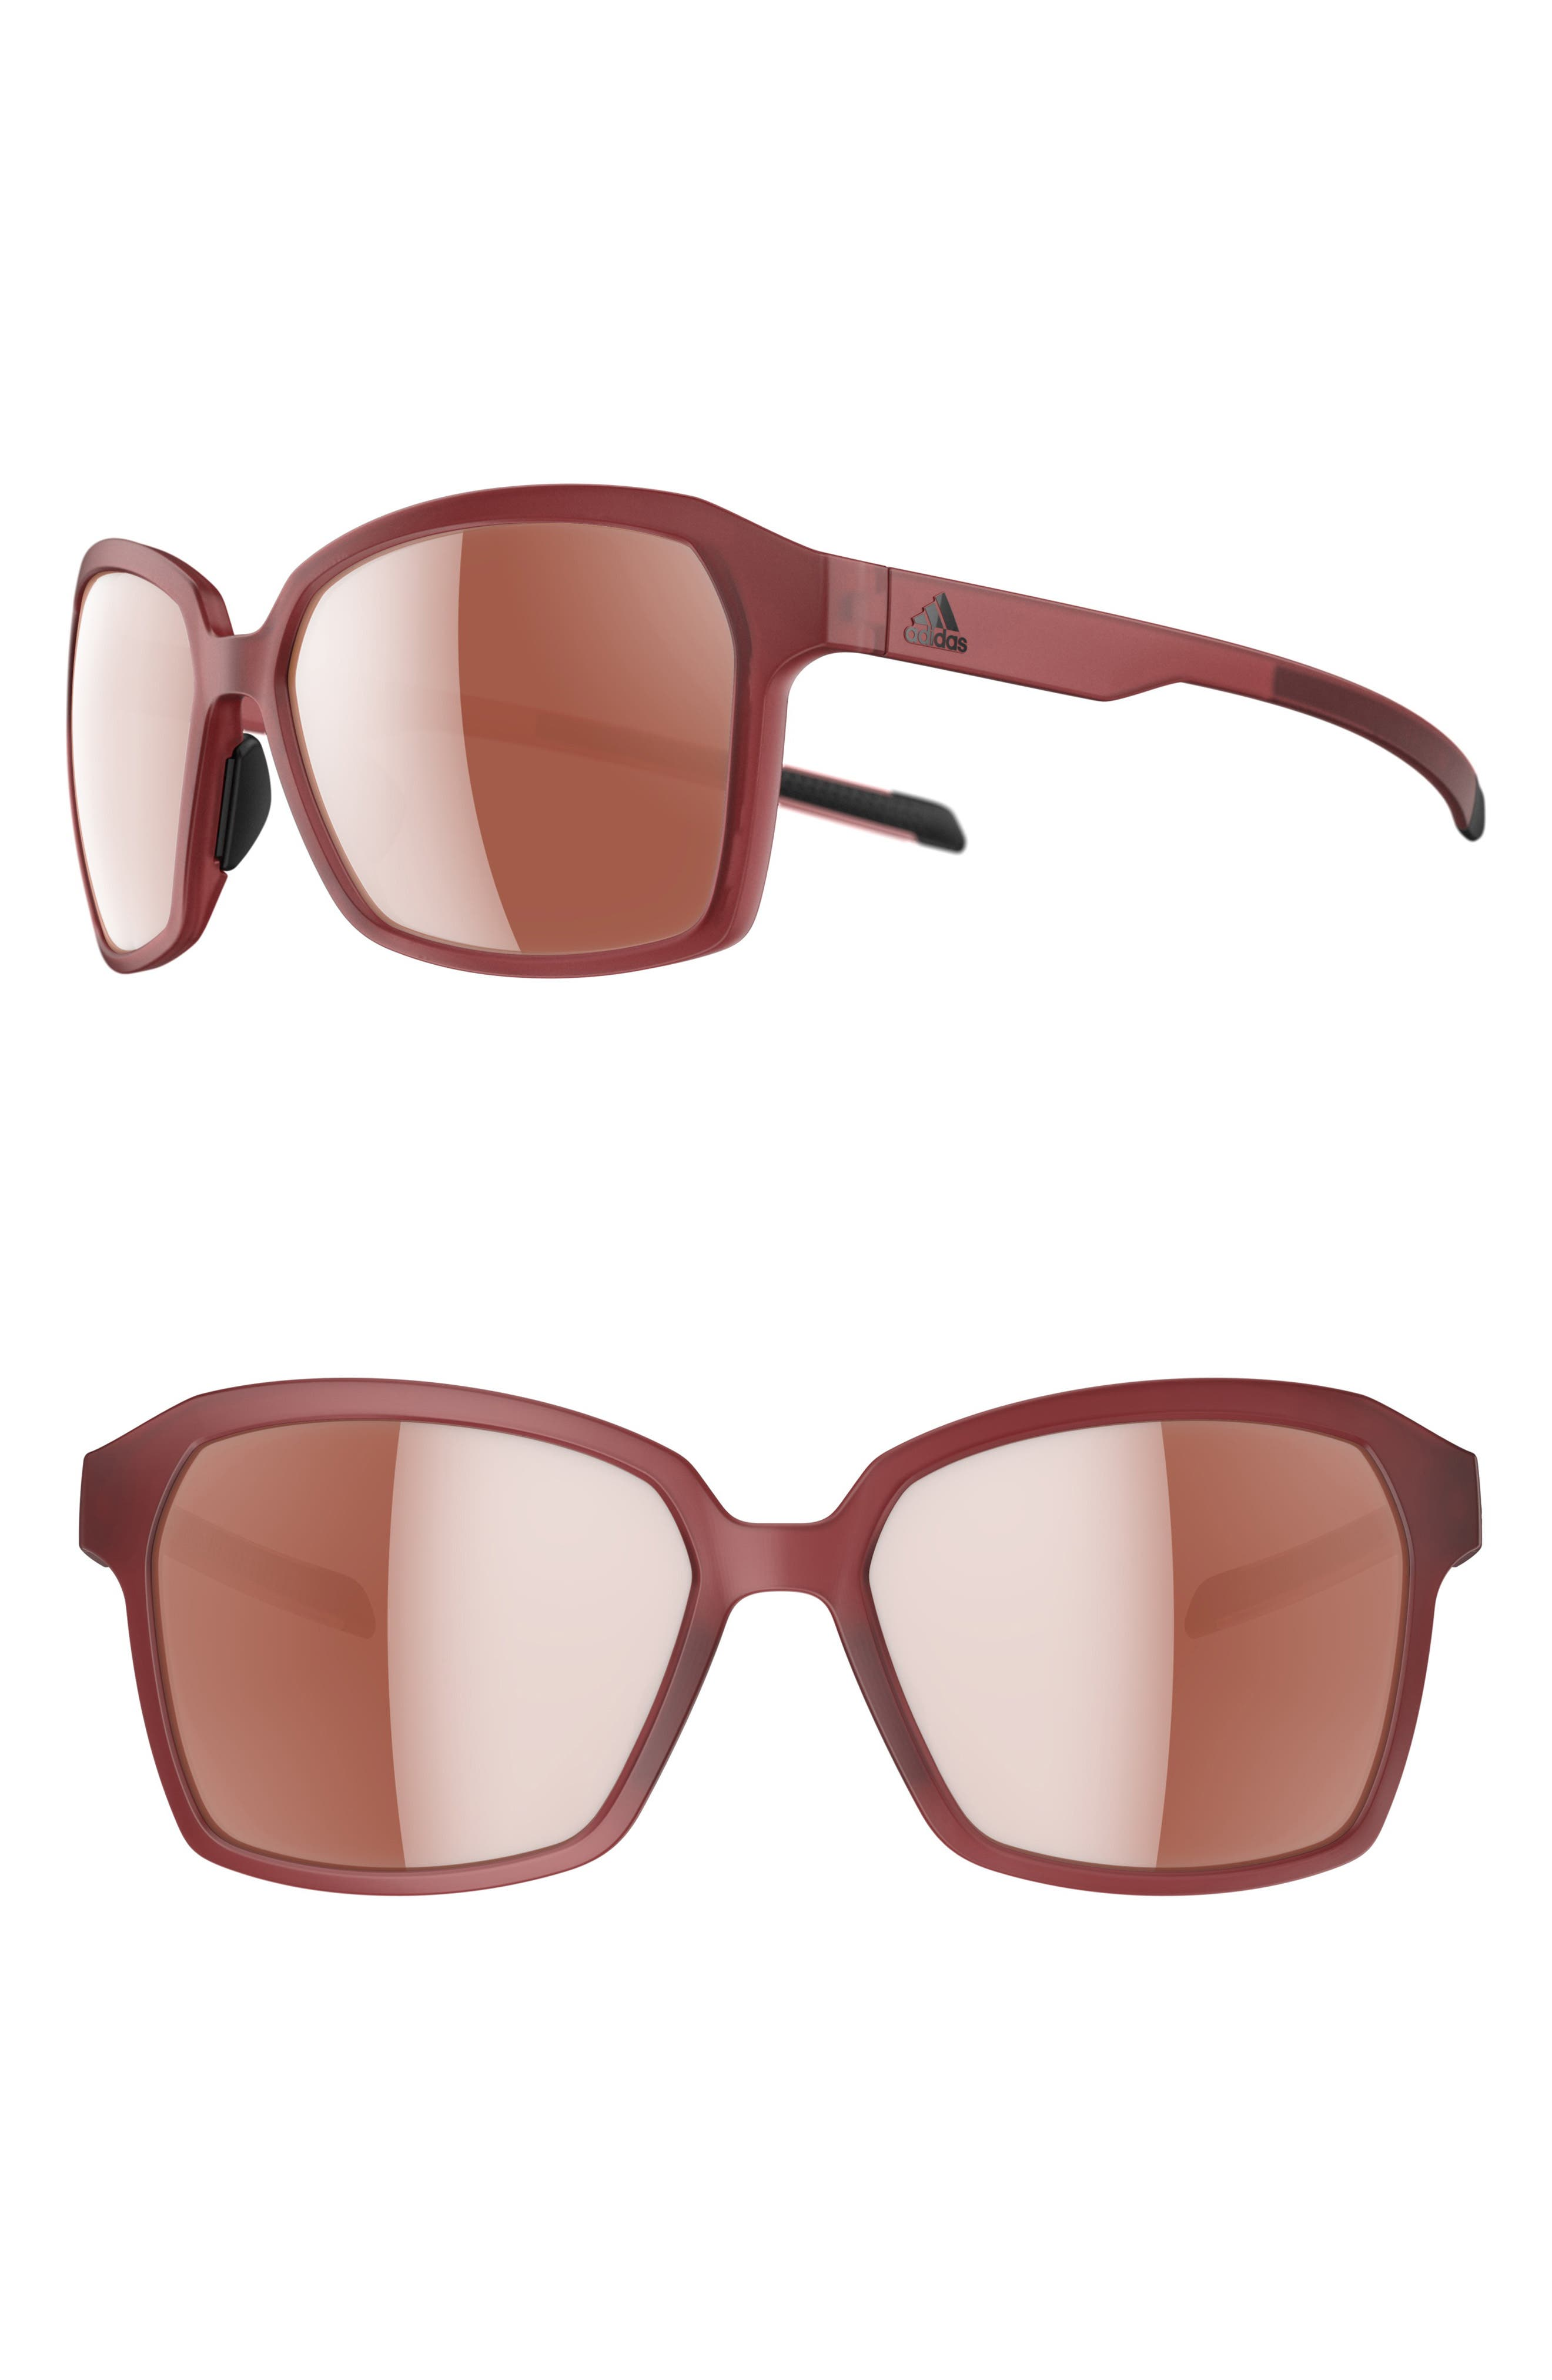 ADIDAS, Aspyr Lst 58mm Sunglasses, Main thumbnail 1, color, TRACE MAROON MATTE/SILVER